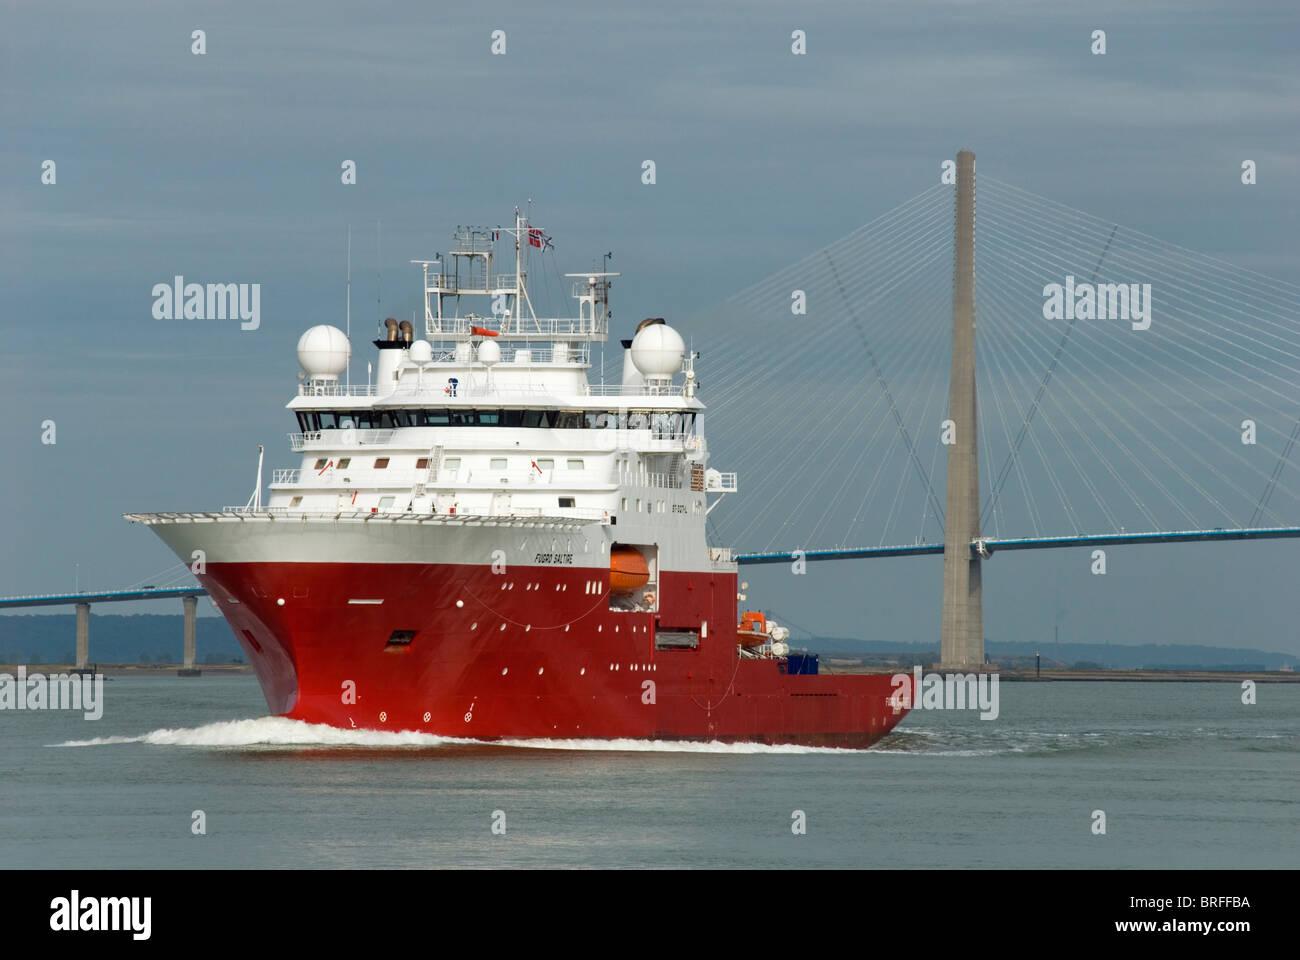 ship - Stock Image